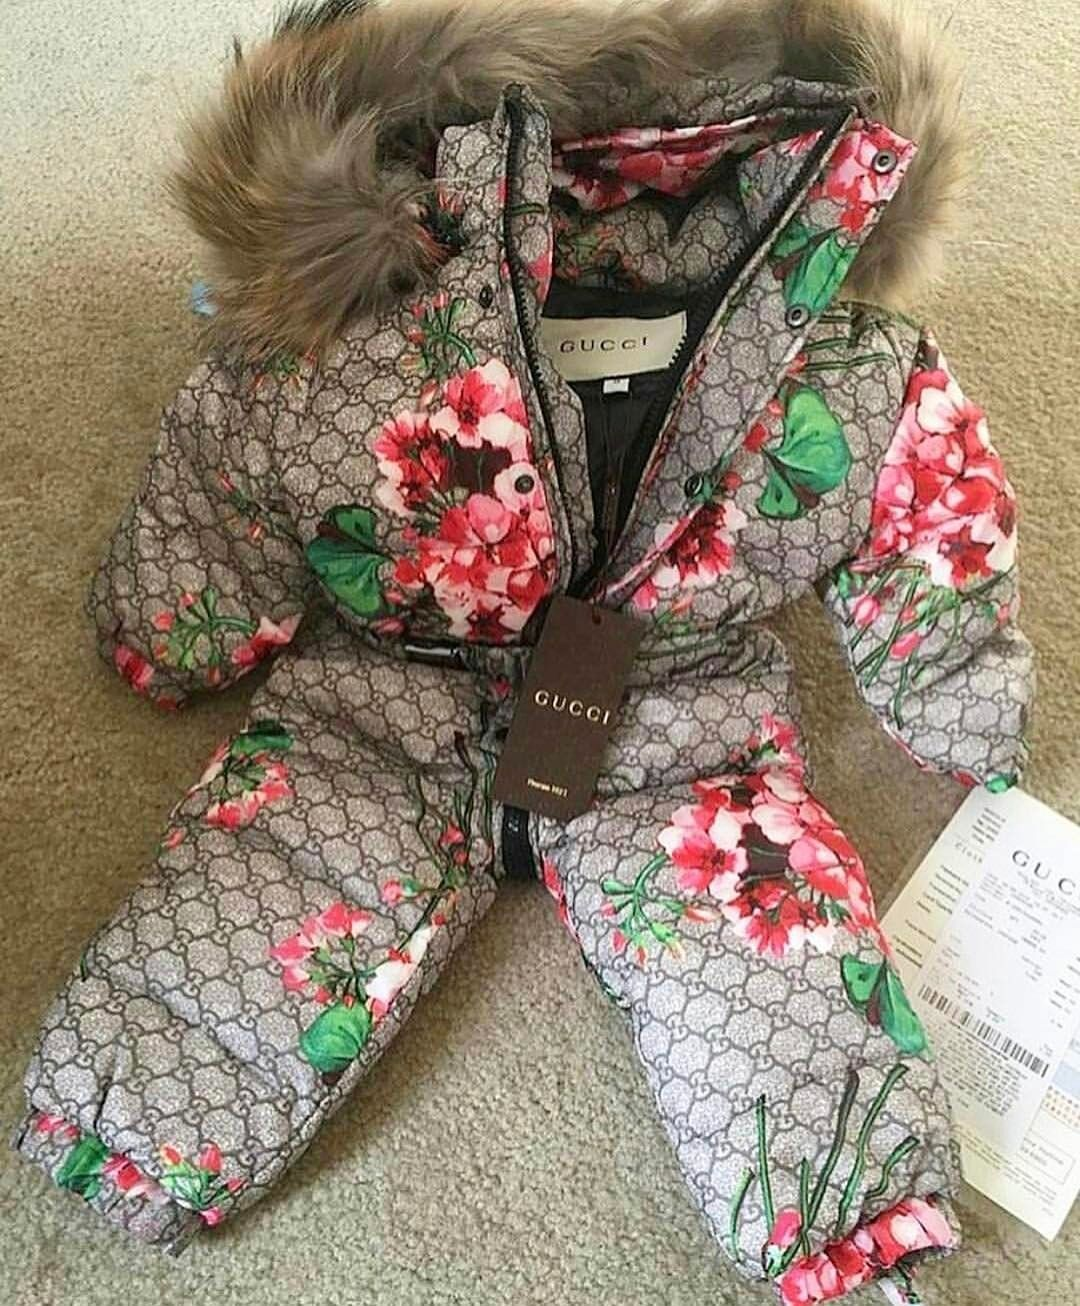 Luxury Designer Baby Clothes | Baby Gucci X ℱsya ℳu ℱytyyaye ℬaviye ѕ Baby Gucci Baby Baby